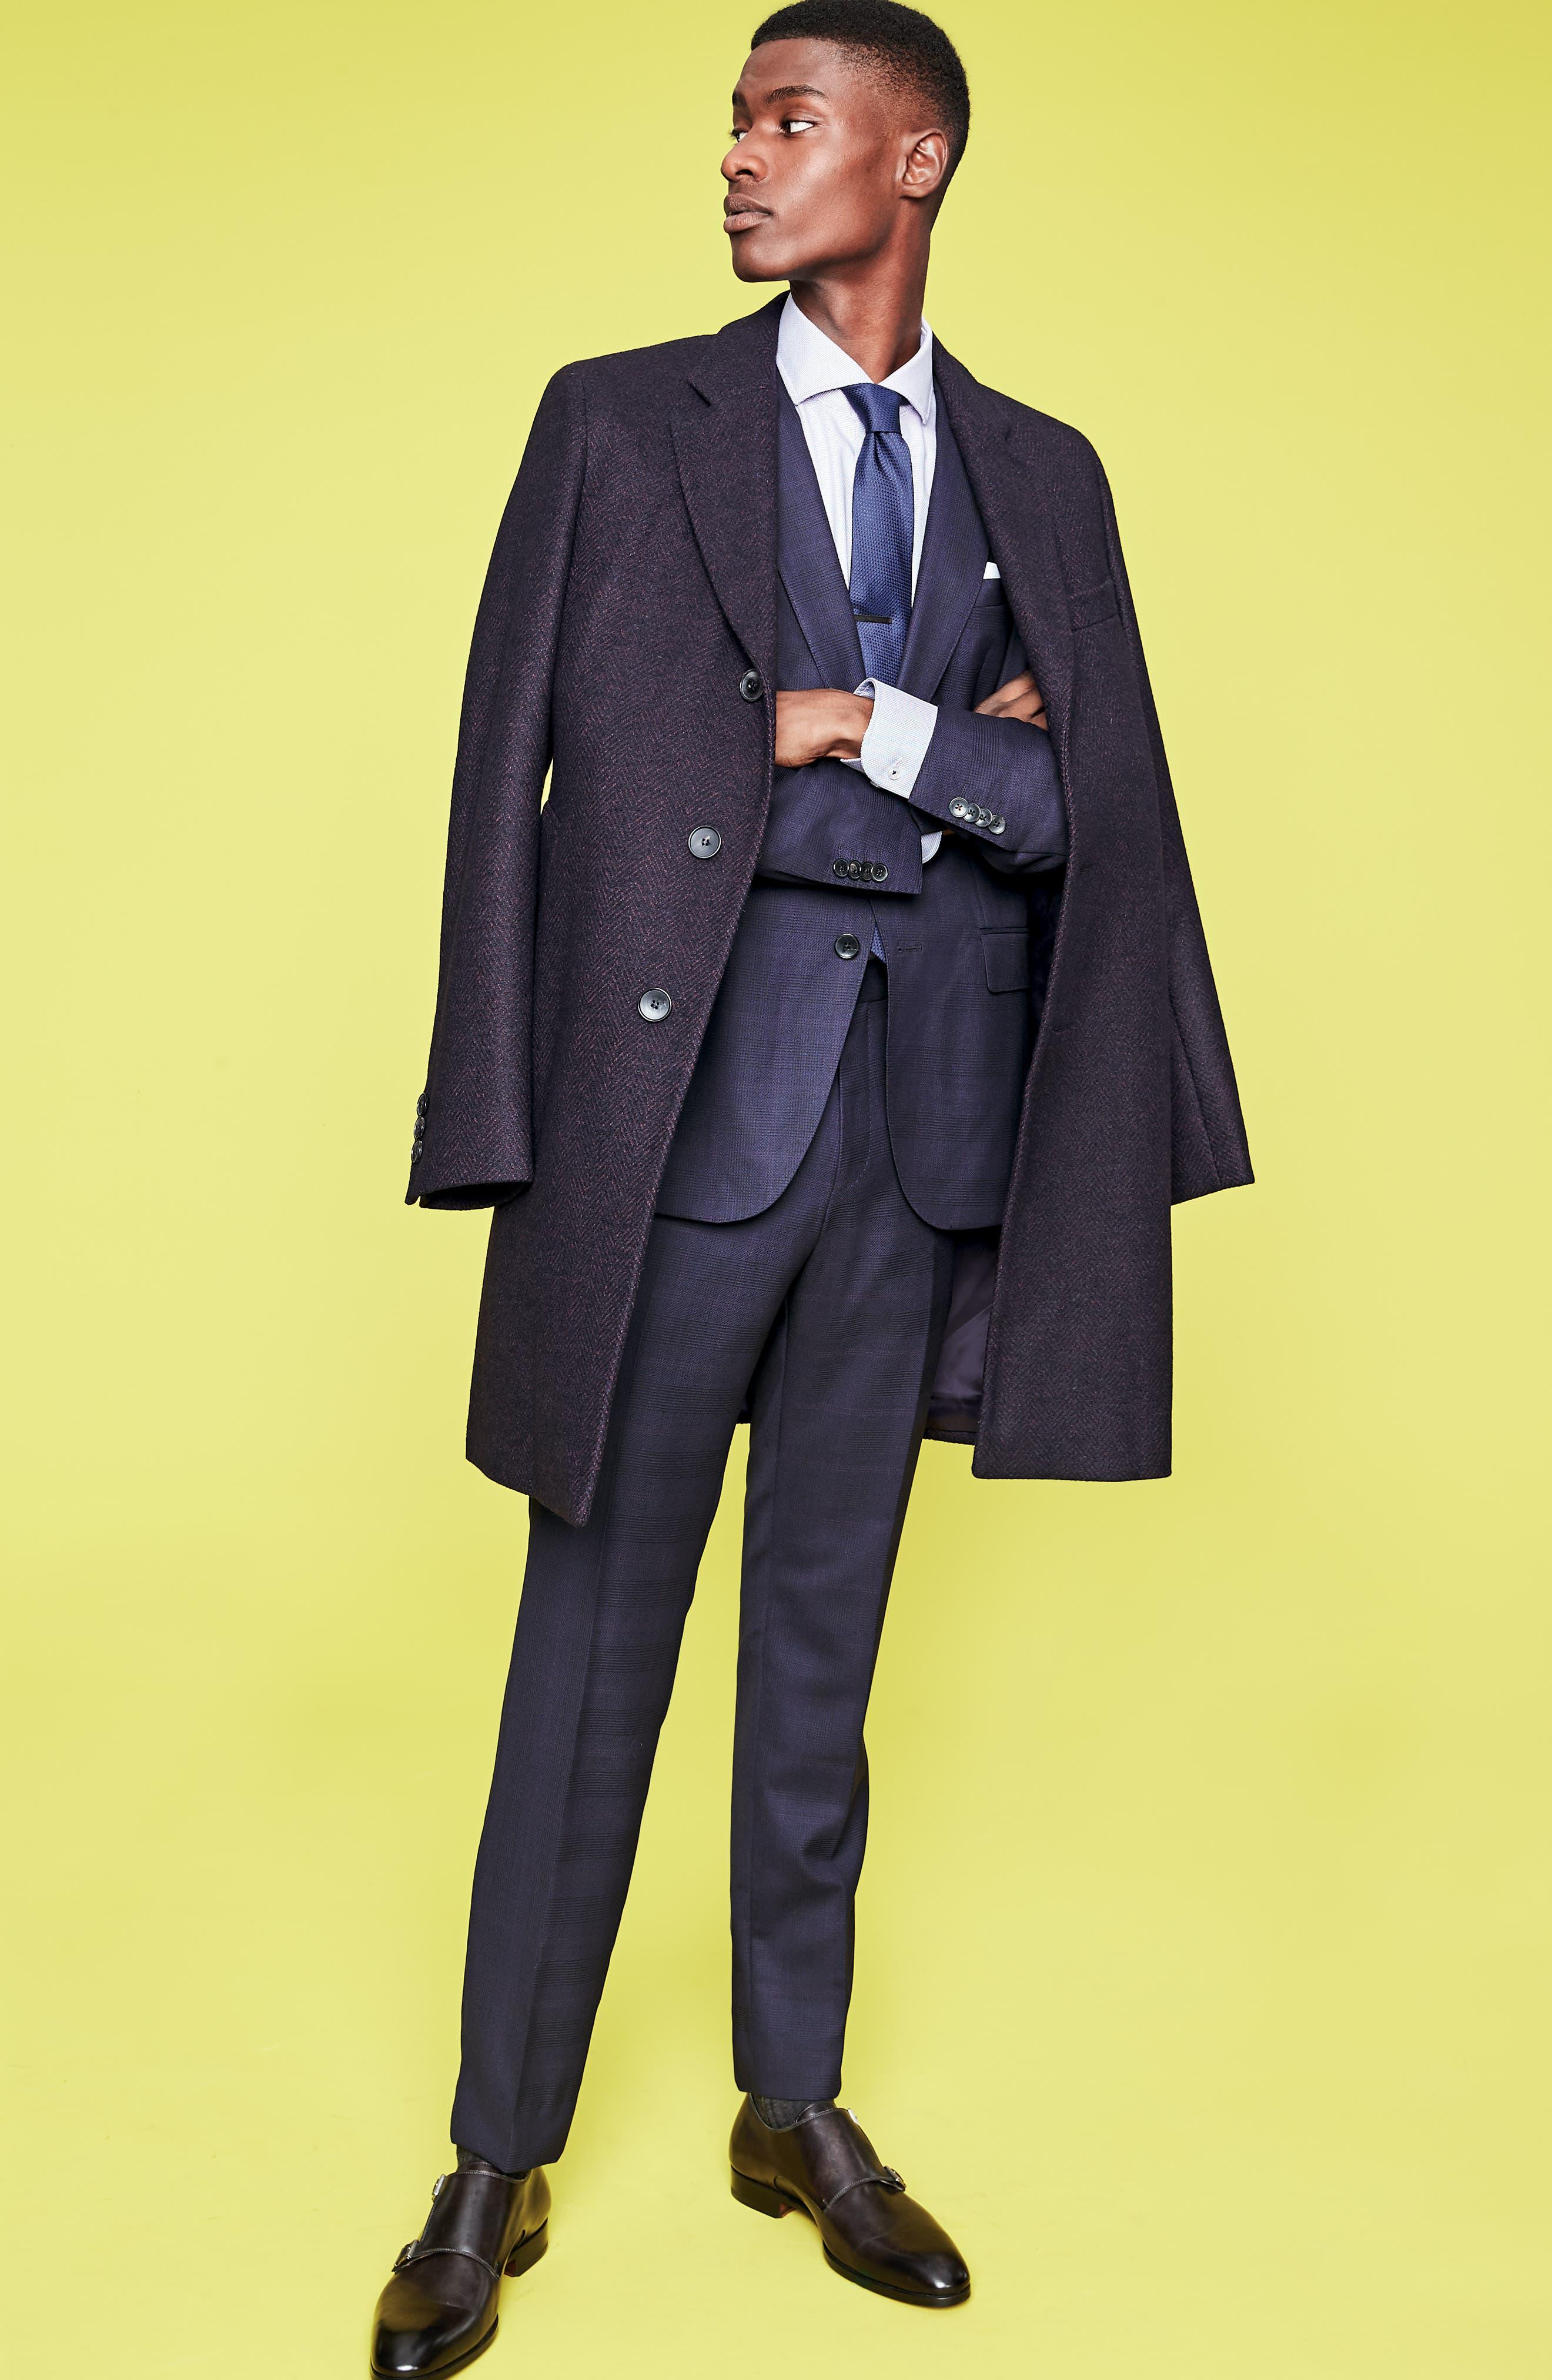 x Nordstrom Huge/Genius Trim Fit Plaid Wool Suit,                             Alternate thumbnail 12, color,                             NAVY